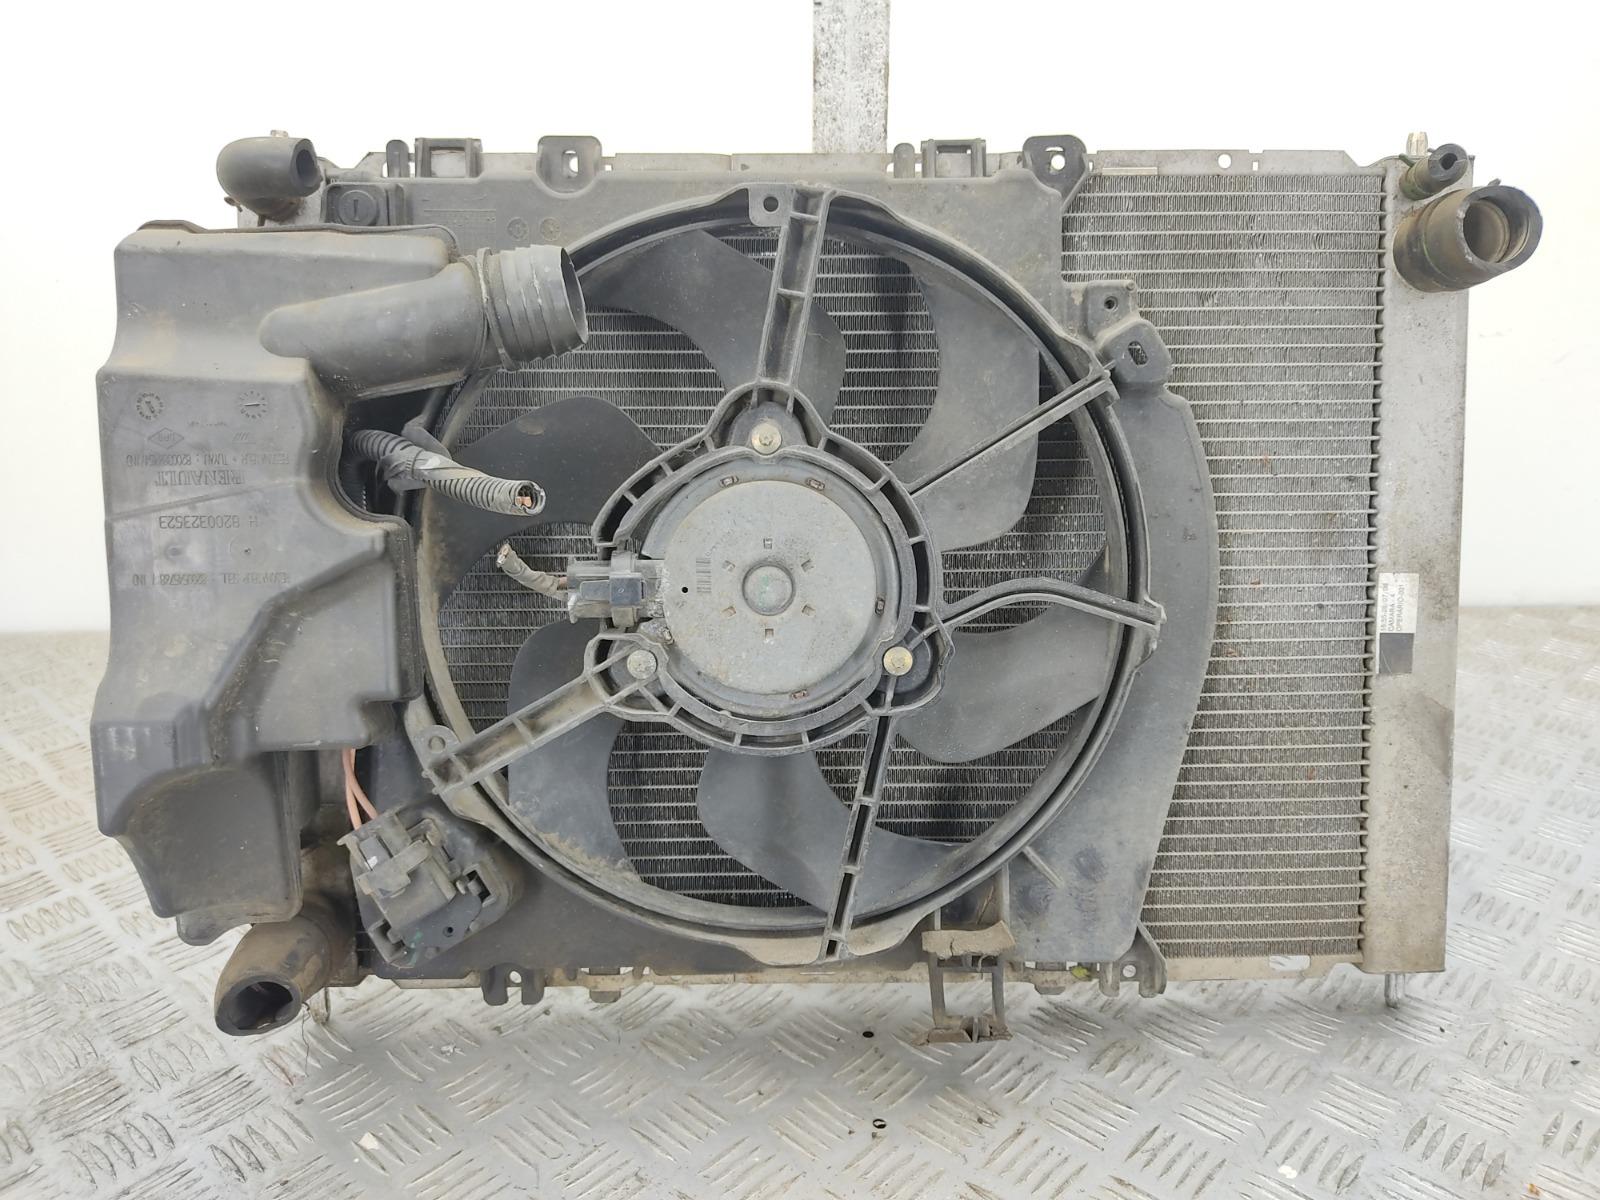 Кассета радиаторов Renault Clio 1.4 I 2006 (б/у)